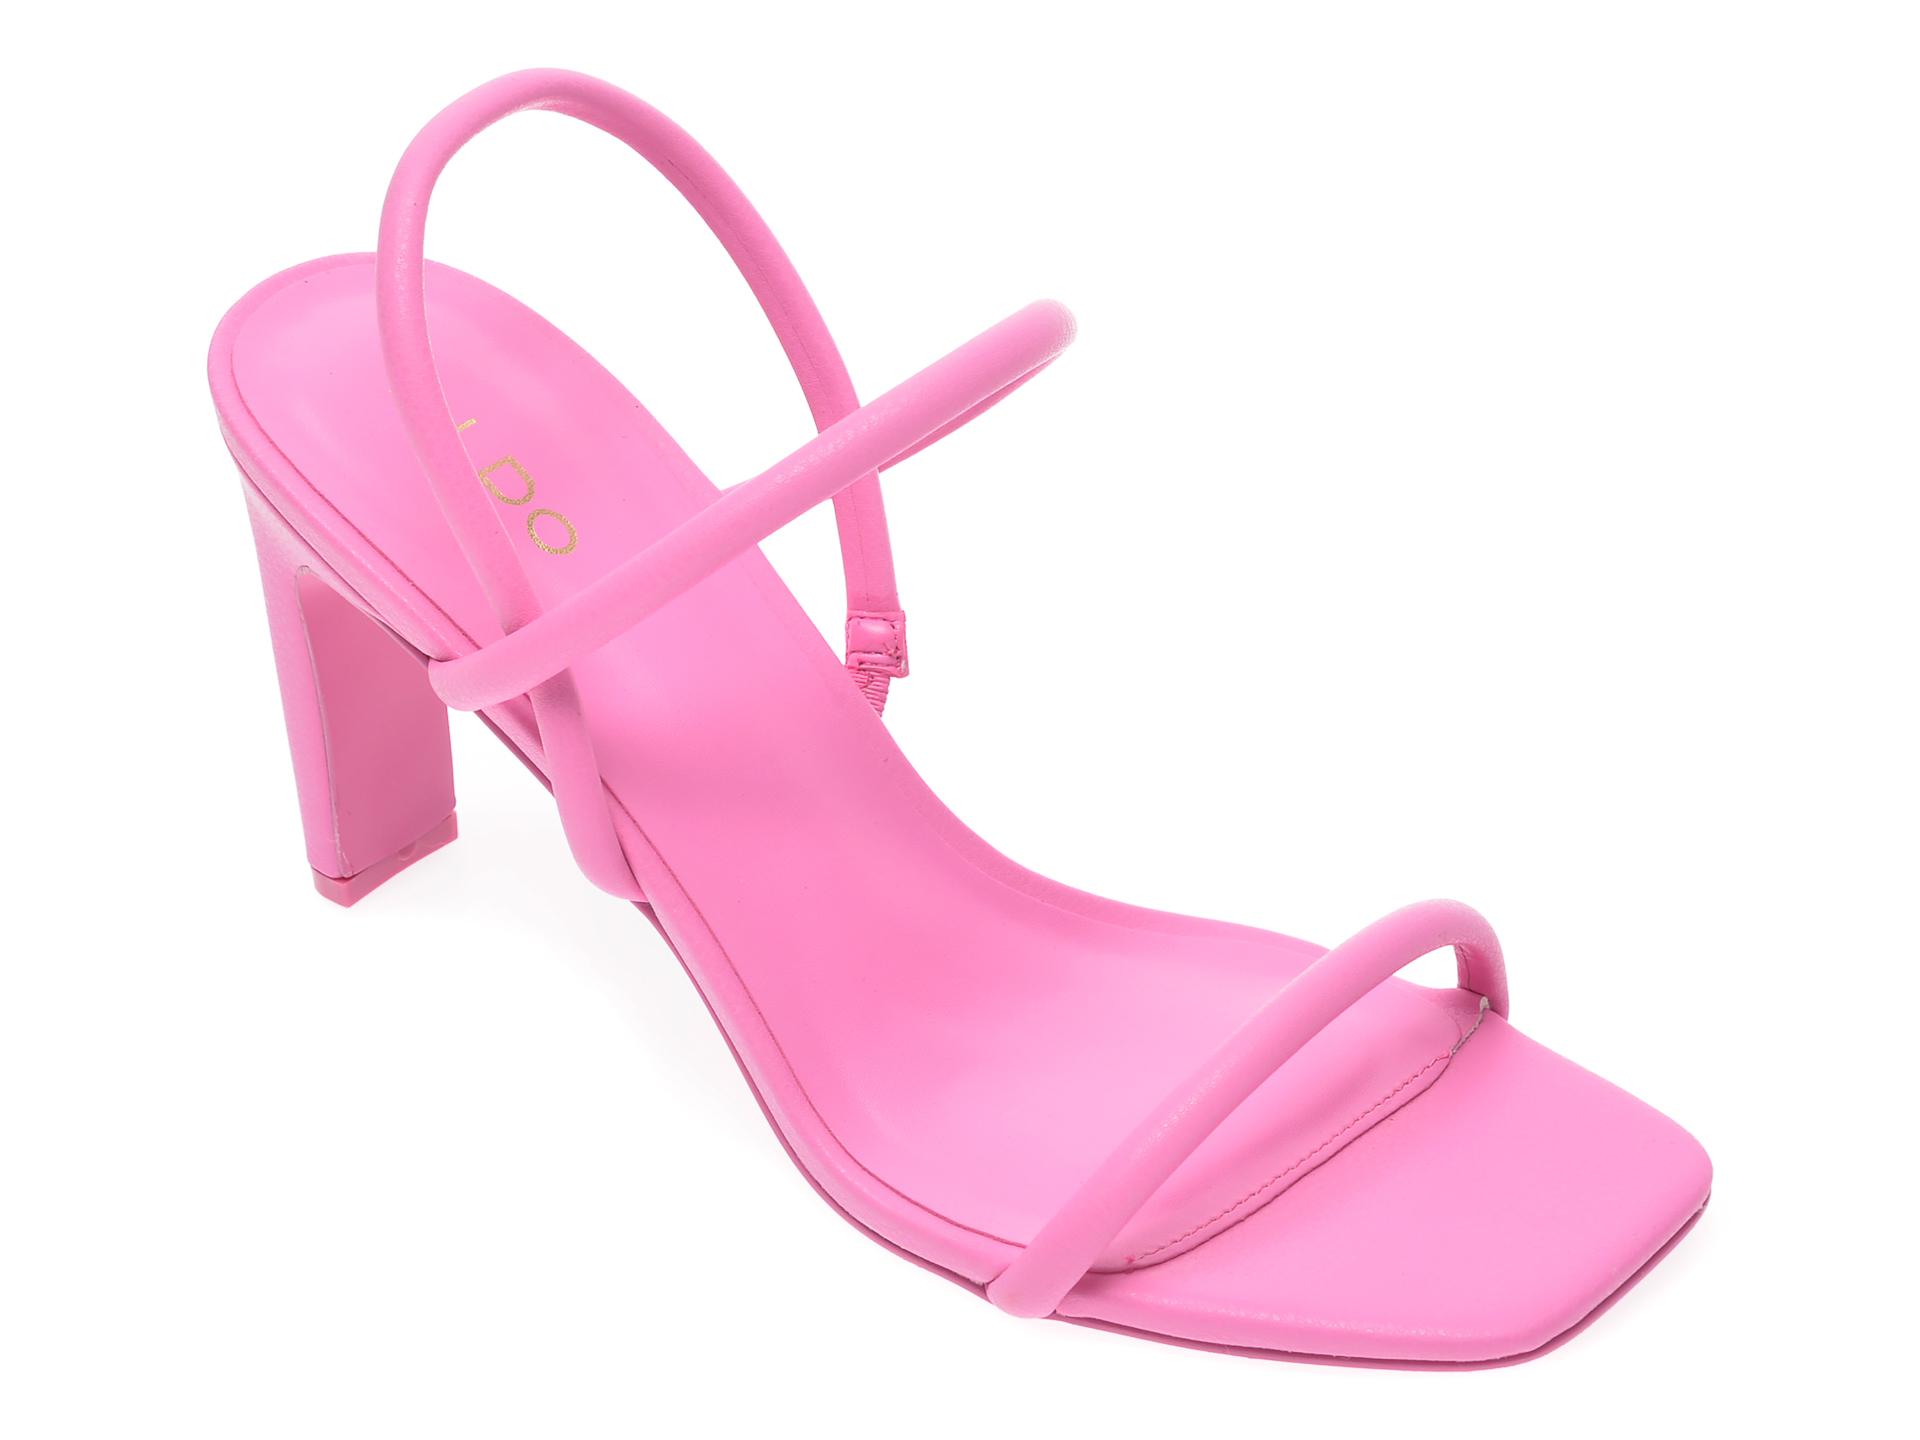 Sandale ALDO roz, Karla680, din piele ecologica